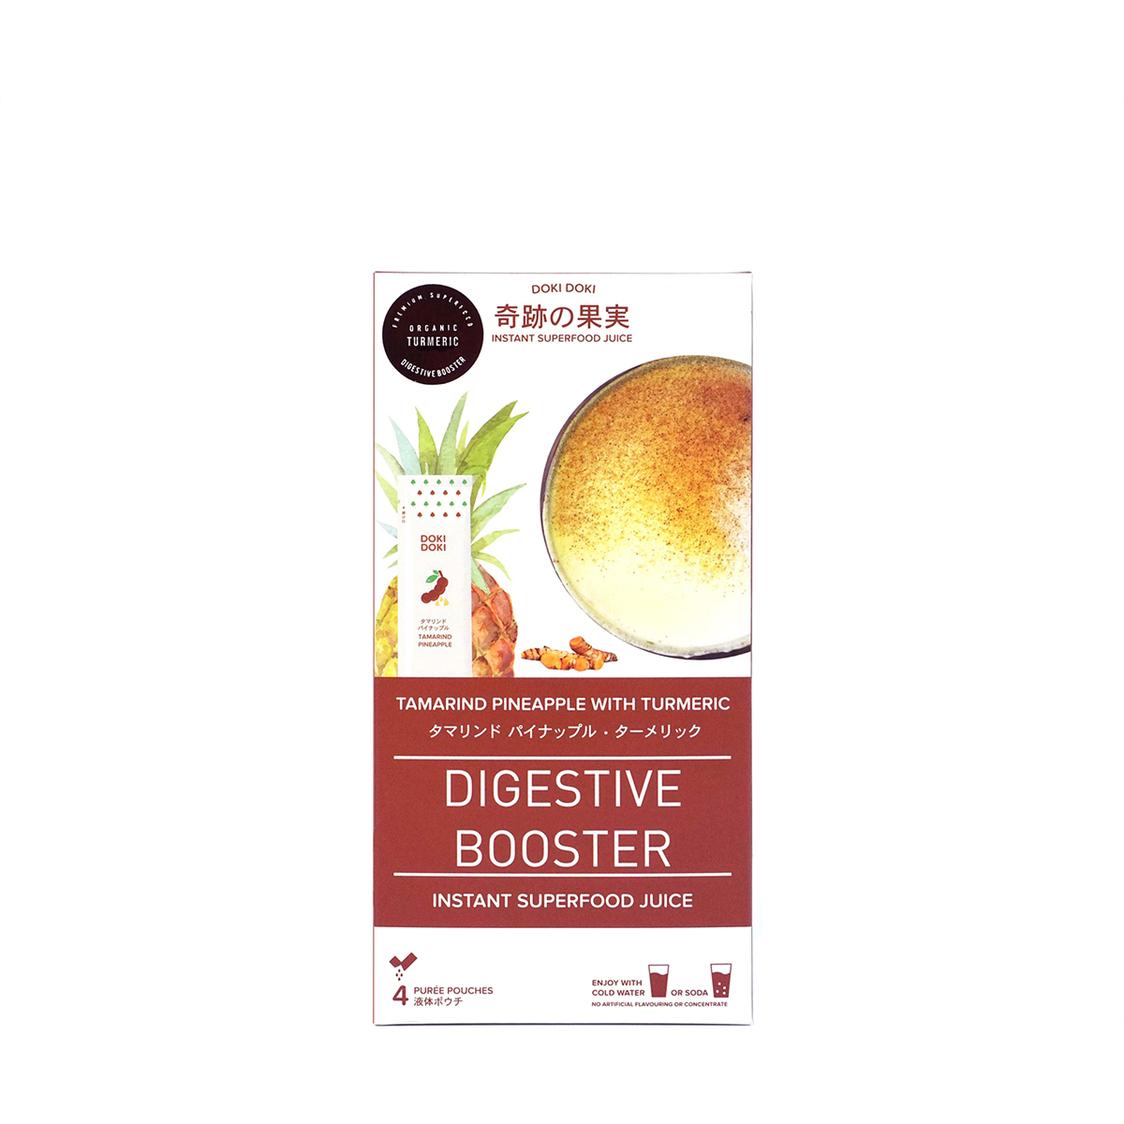 Superfood Tamarind Pineapple Turmeric Digestive Booster 4s